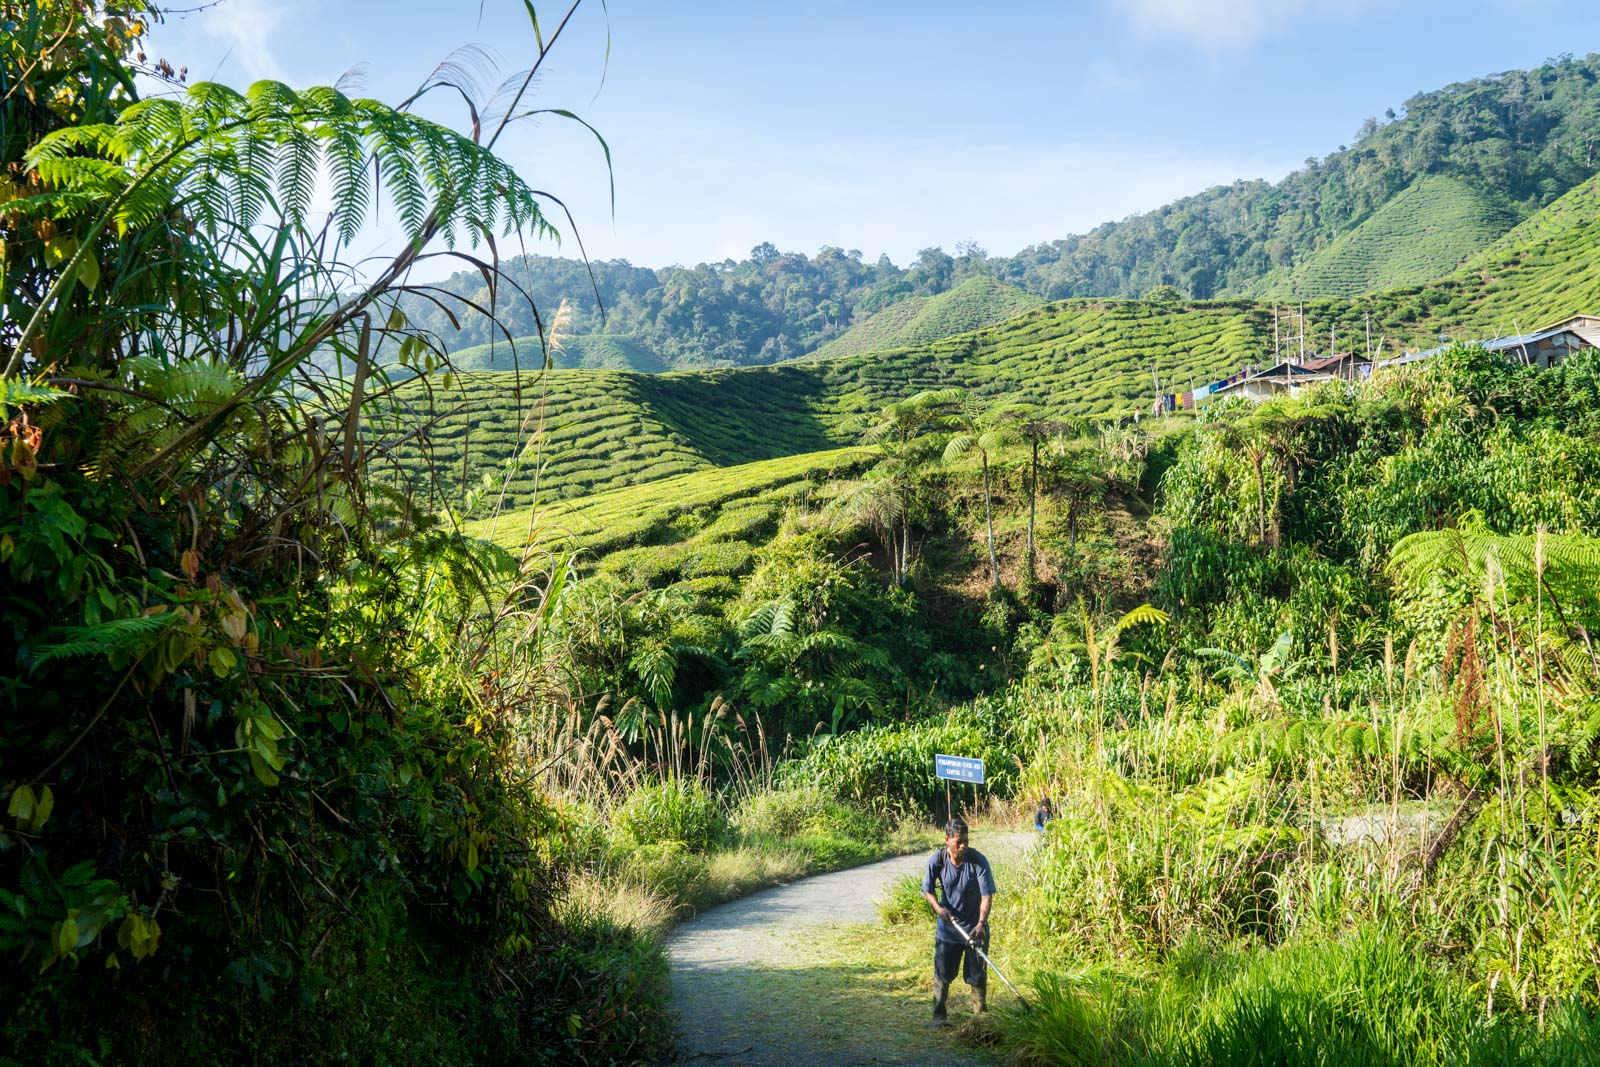 Cameron Highlands hiking, Malaysia